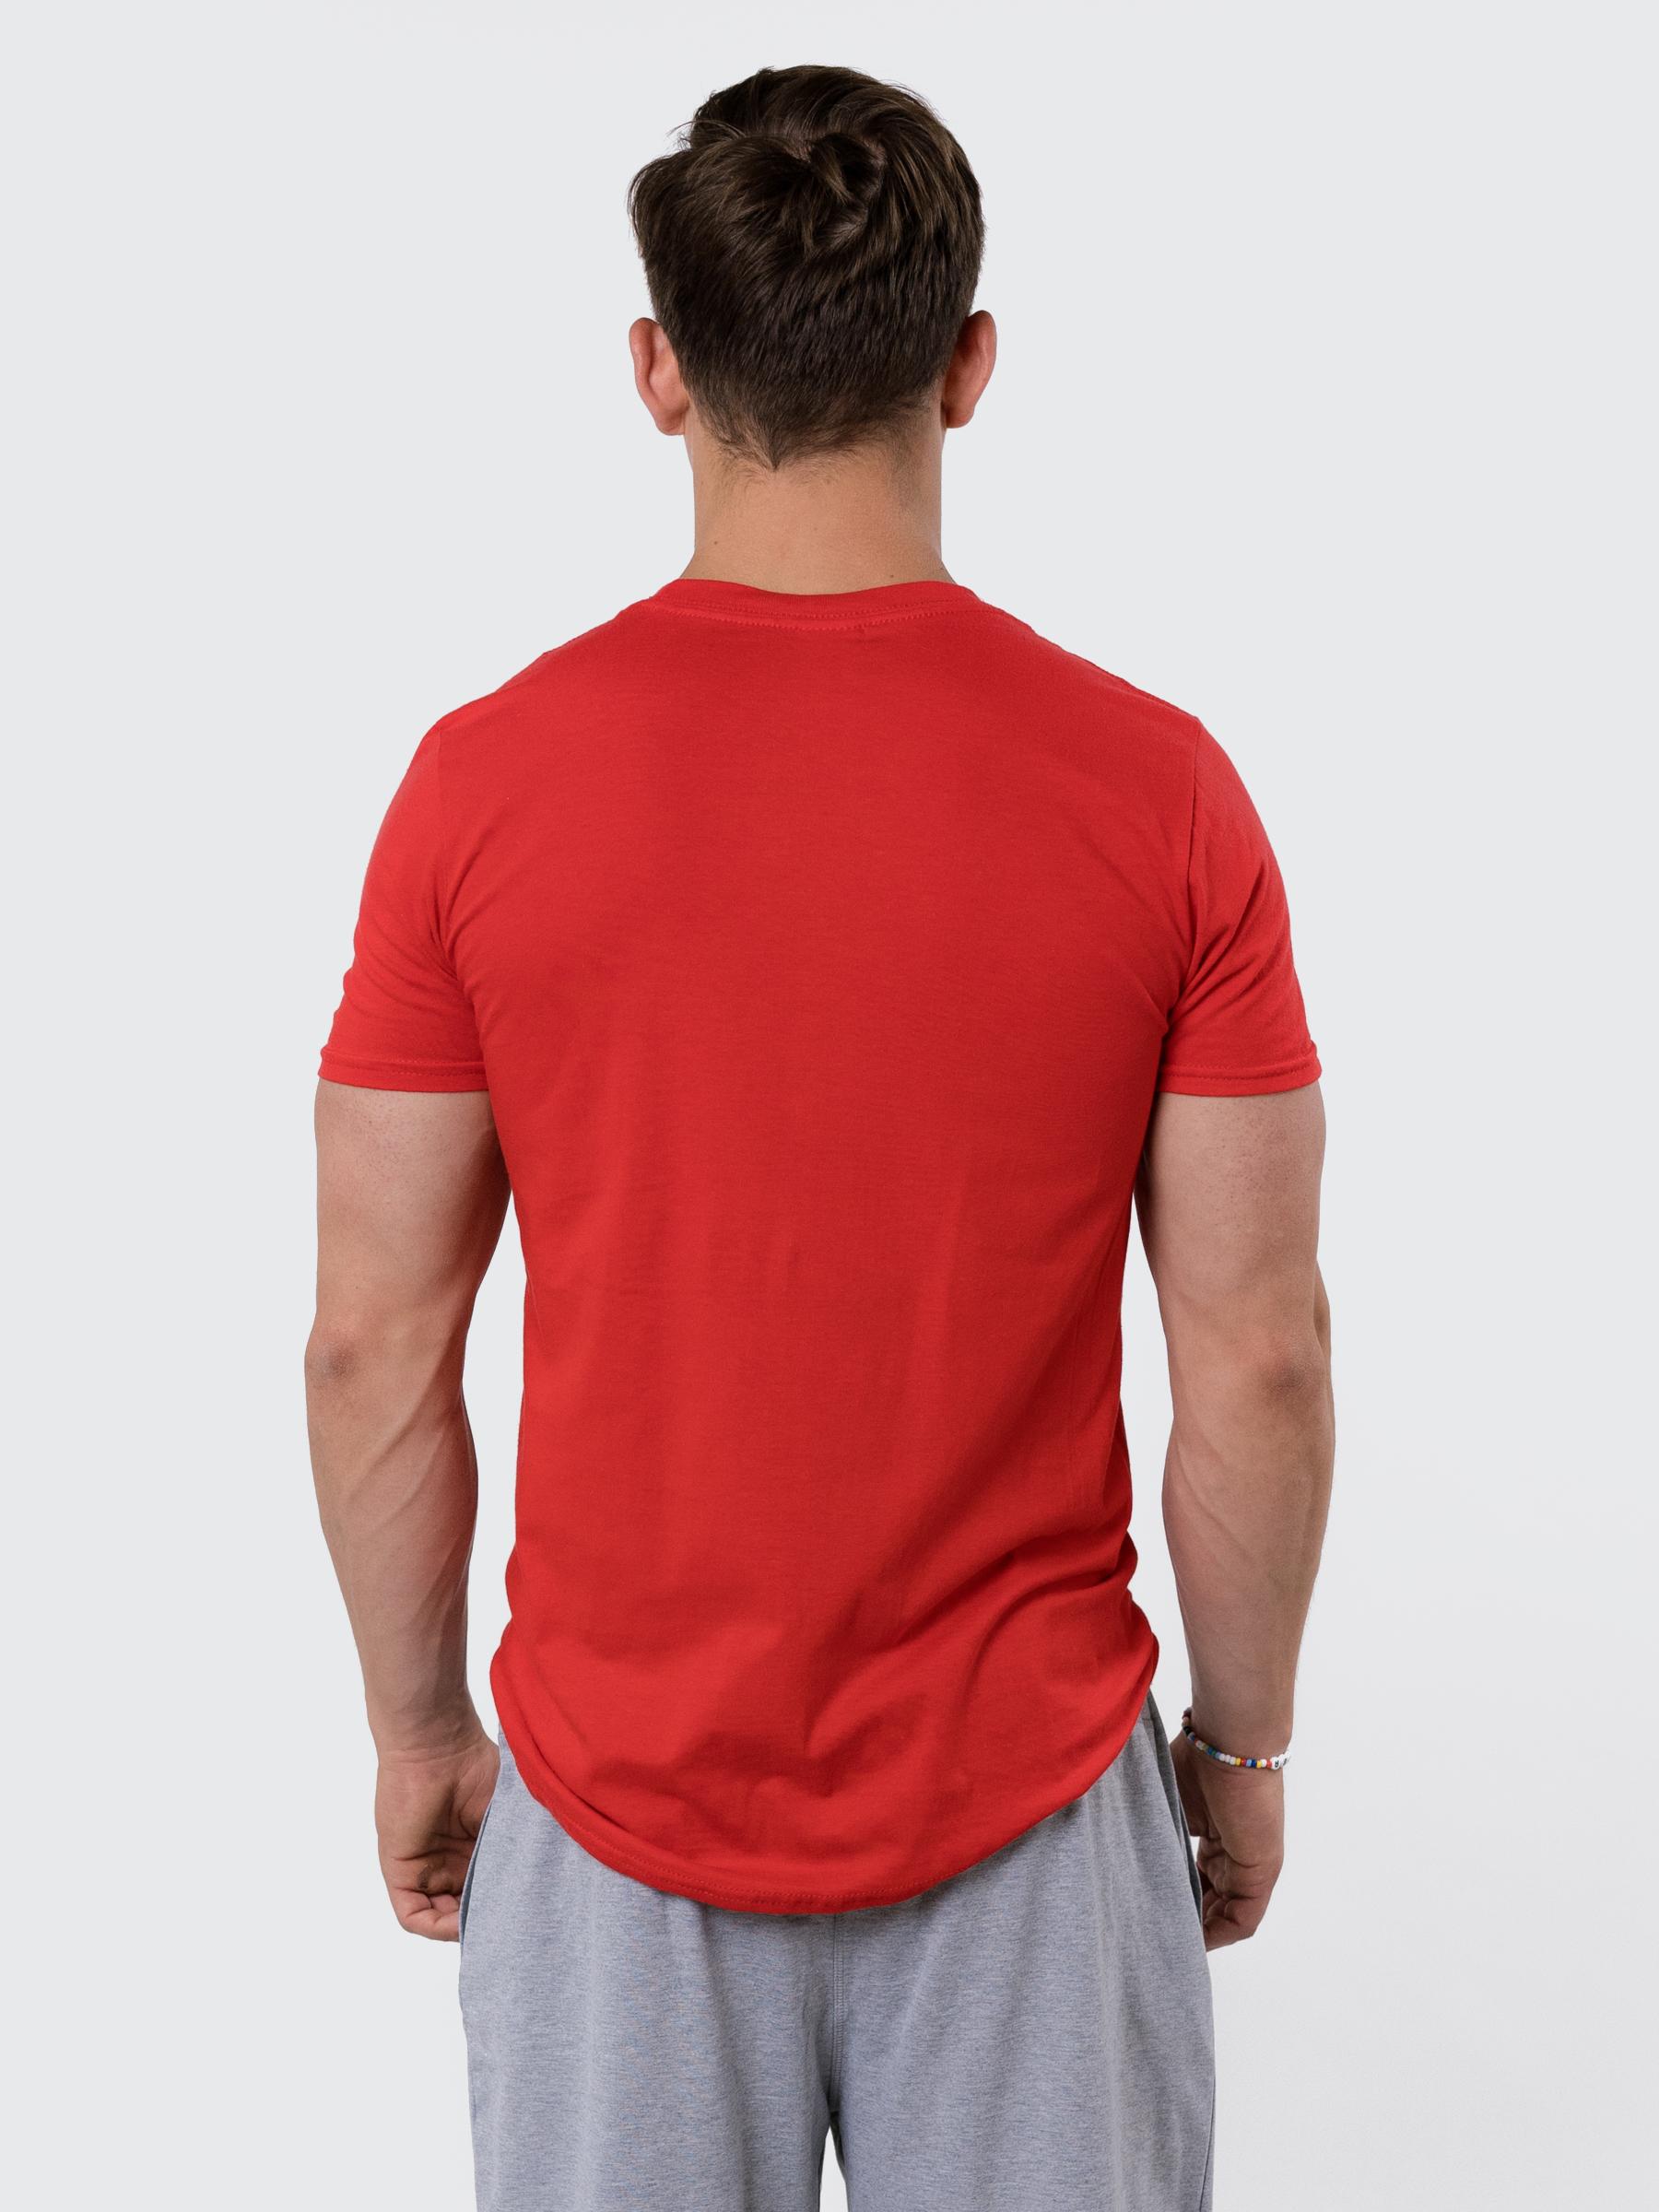 T-Shirt Fredagsmys Herr